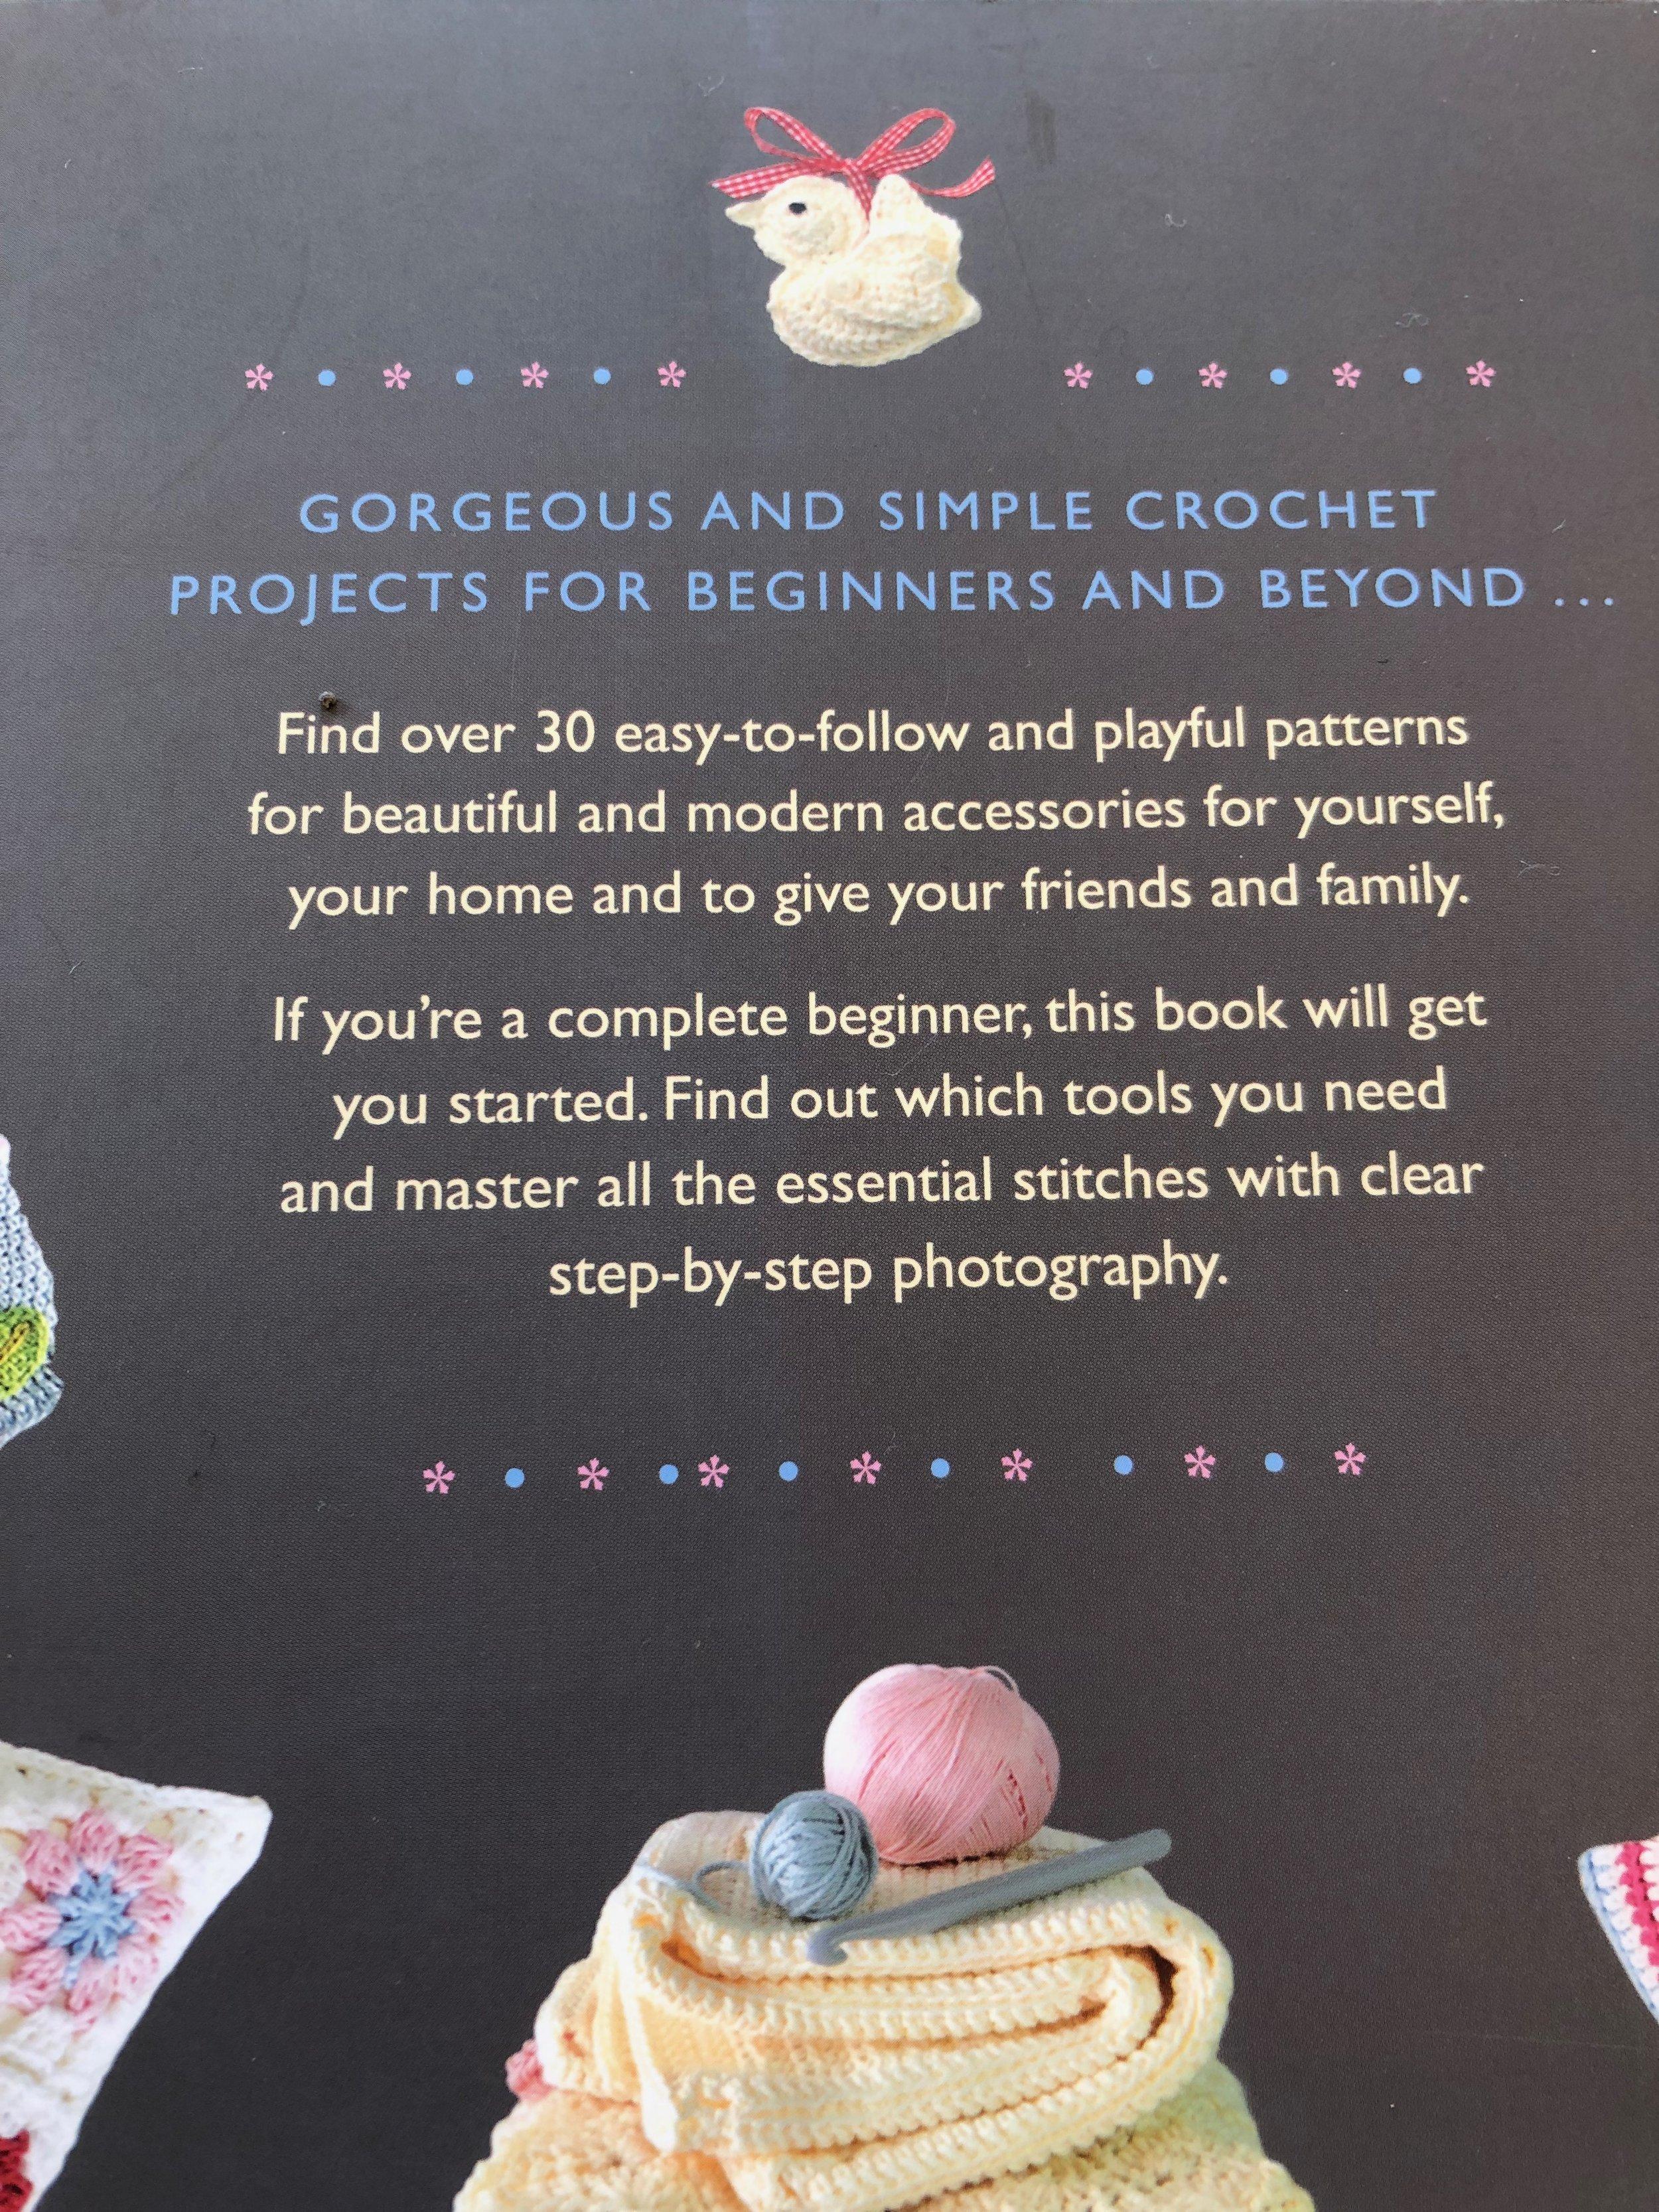 Ruby and Custard's Crochet Book